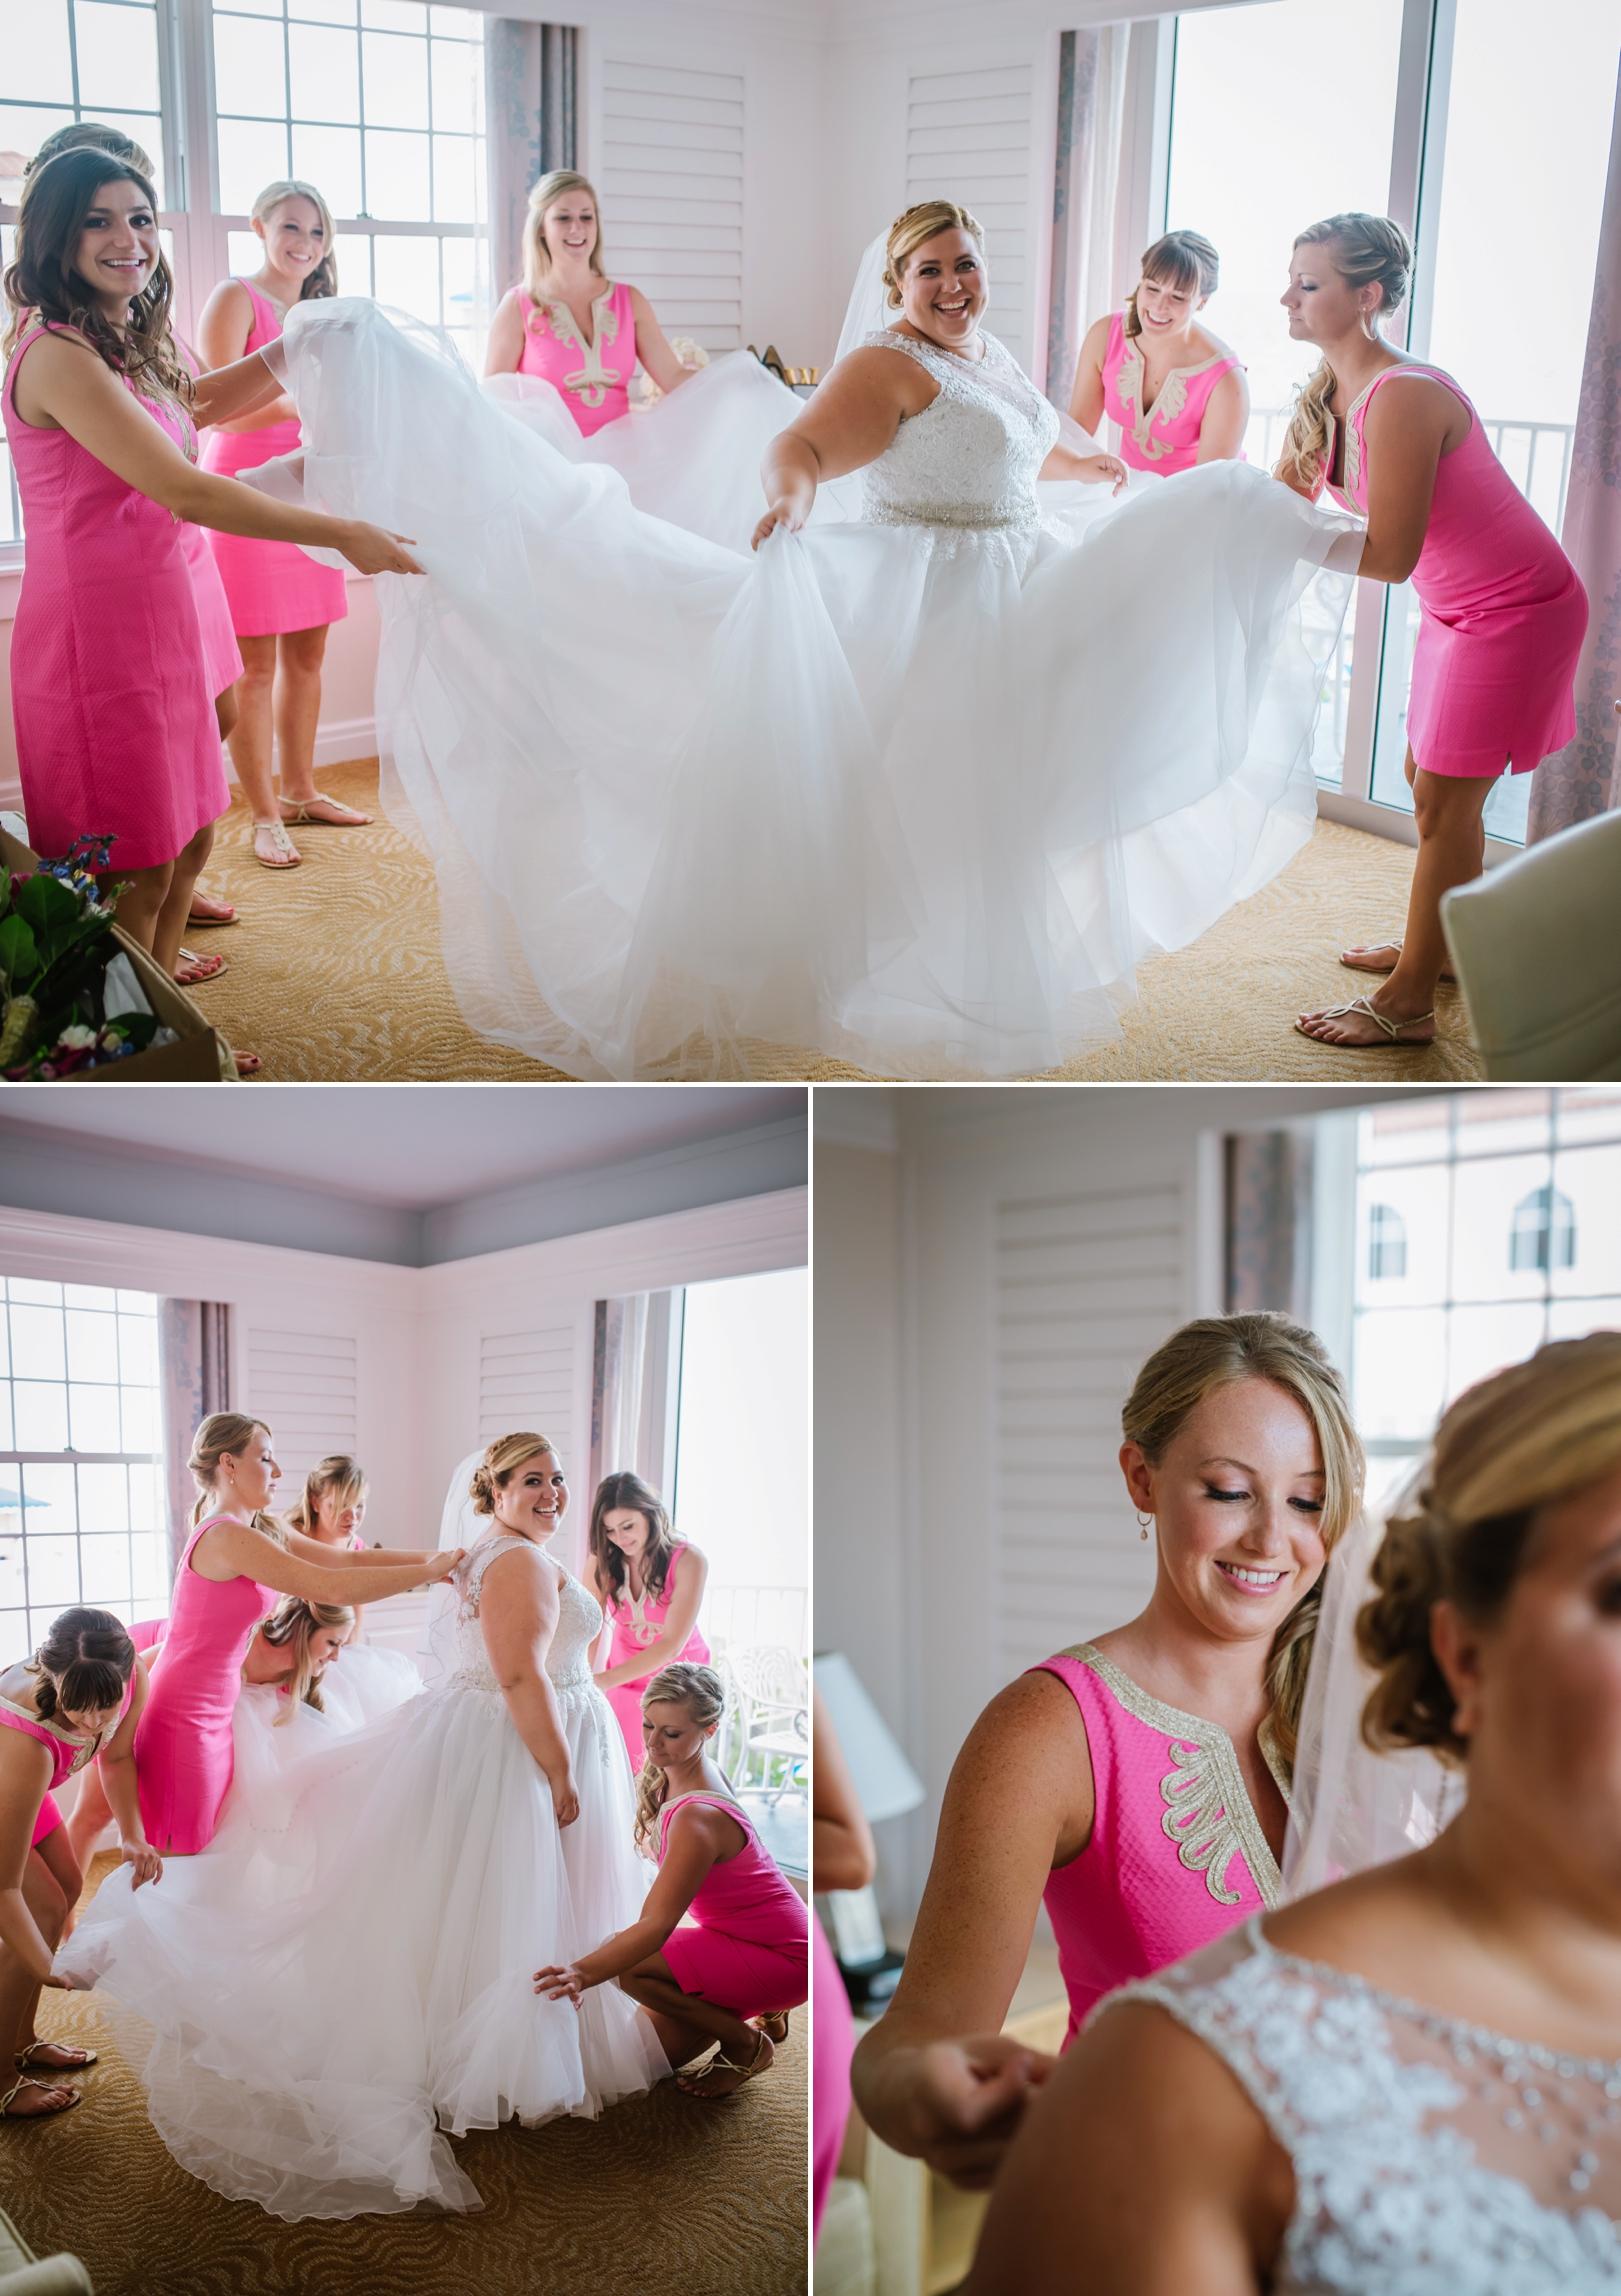 St-pete-wedding-photographer-don-caesar-ashlee-hamon_0008.jpg